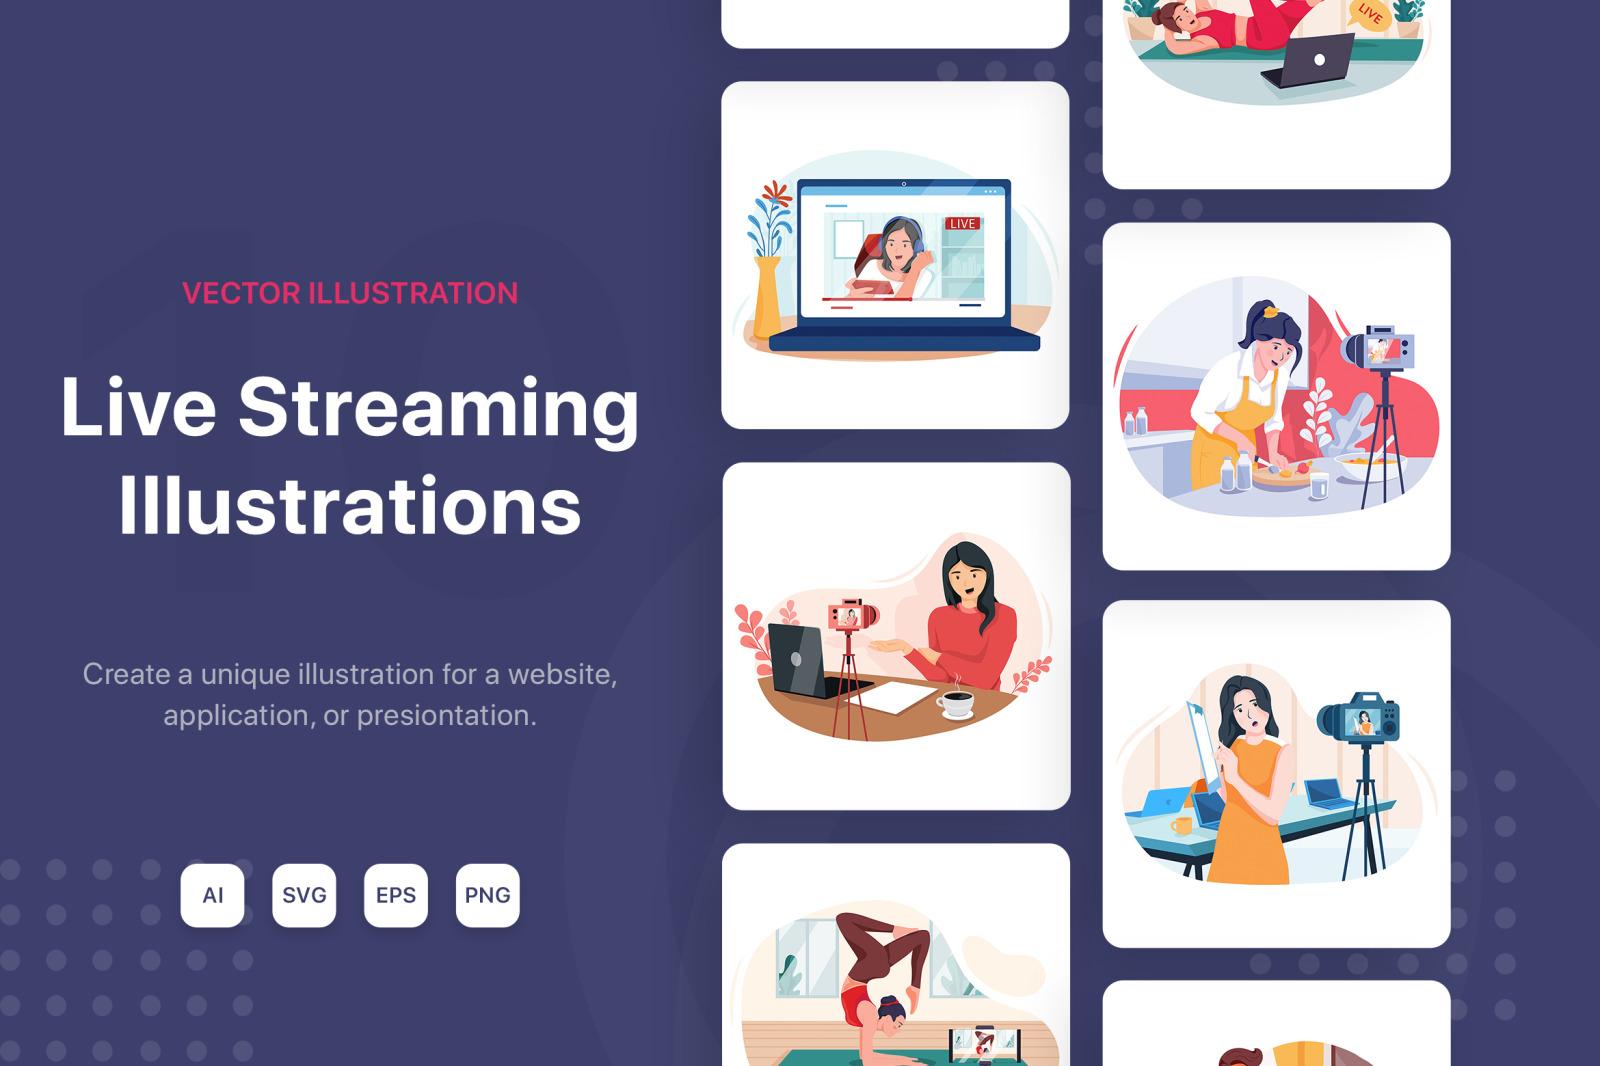 M142_Live Streaming Illustrations